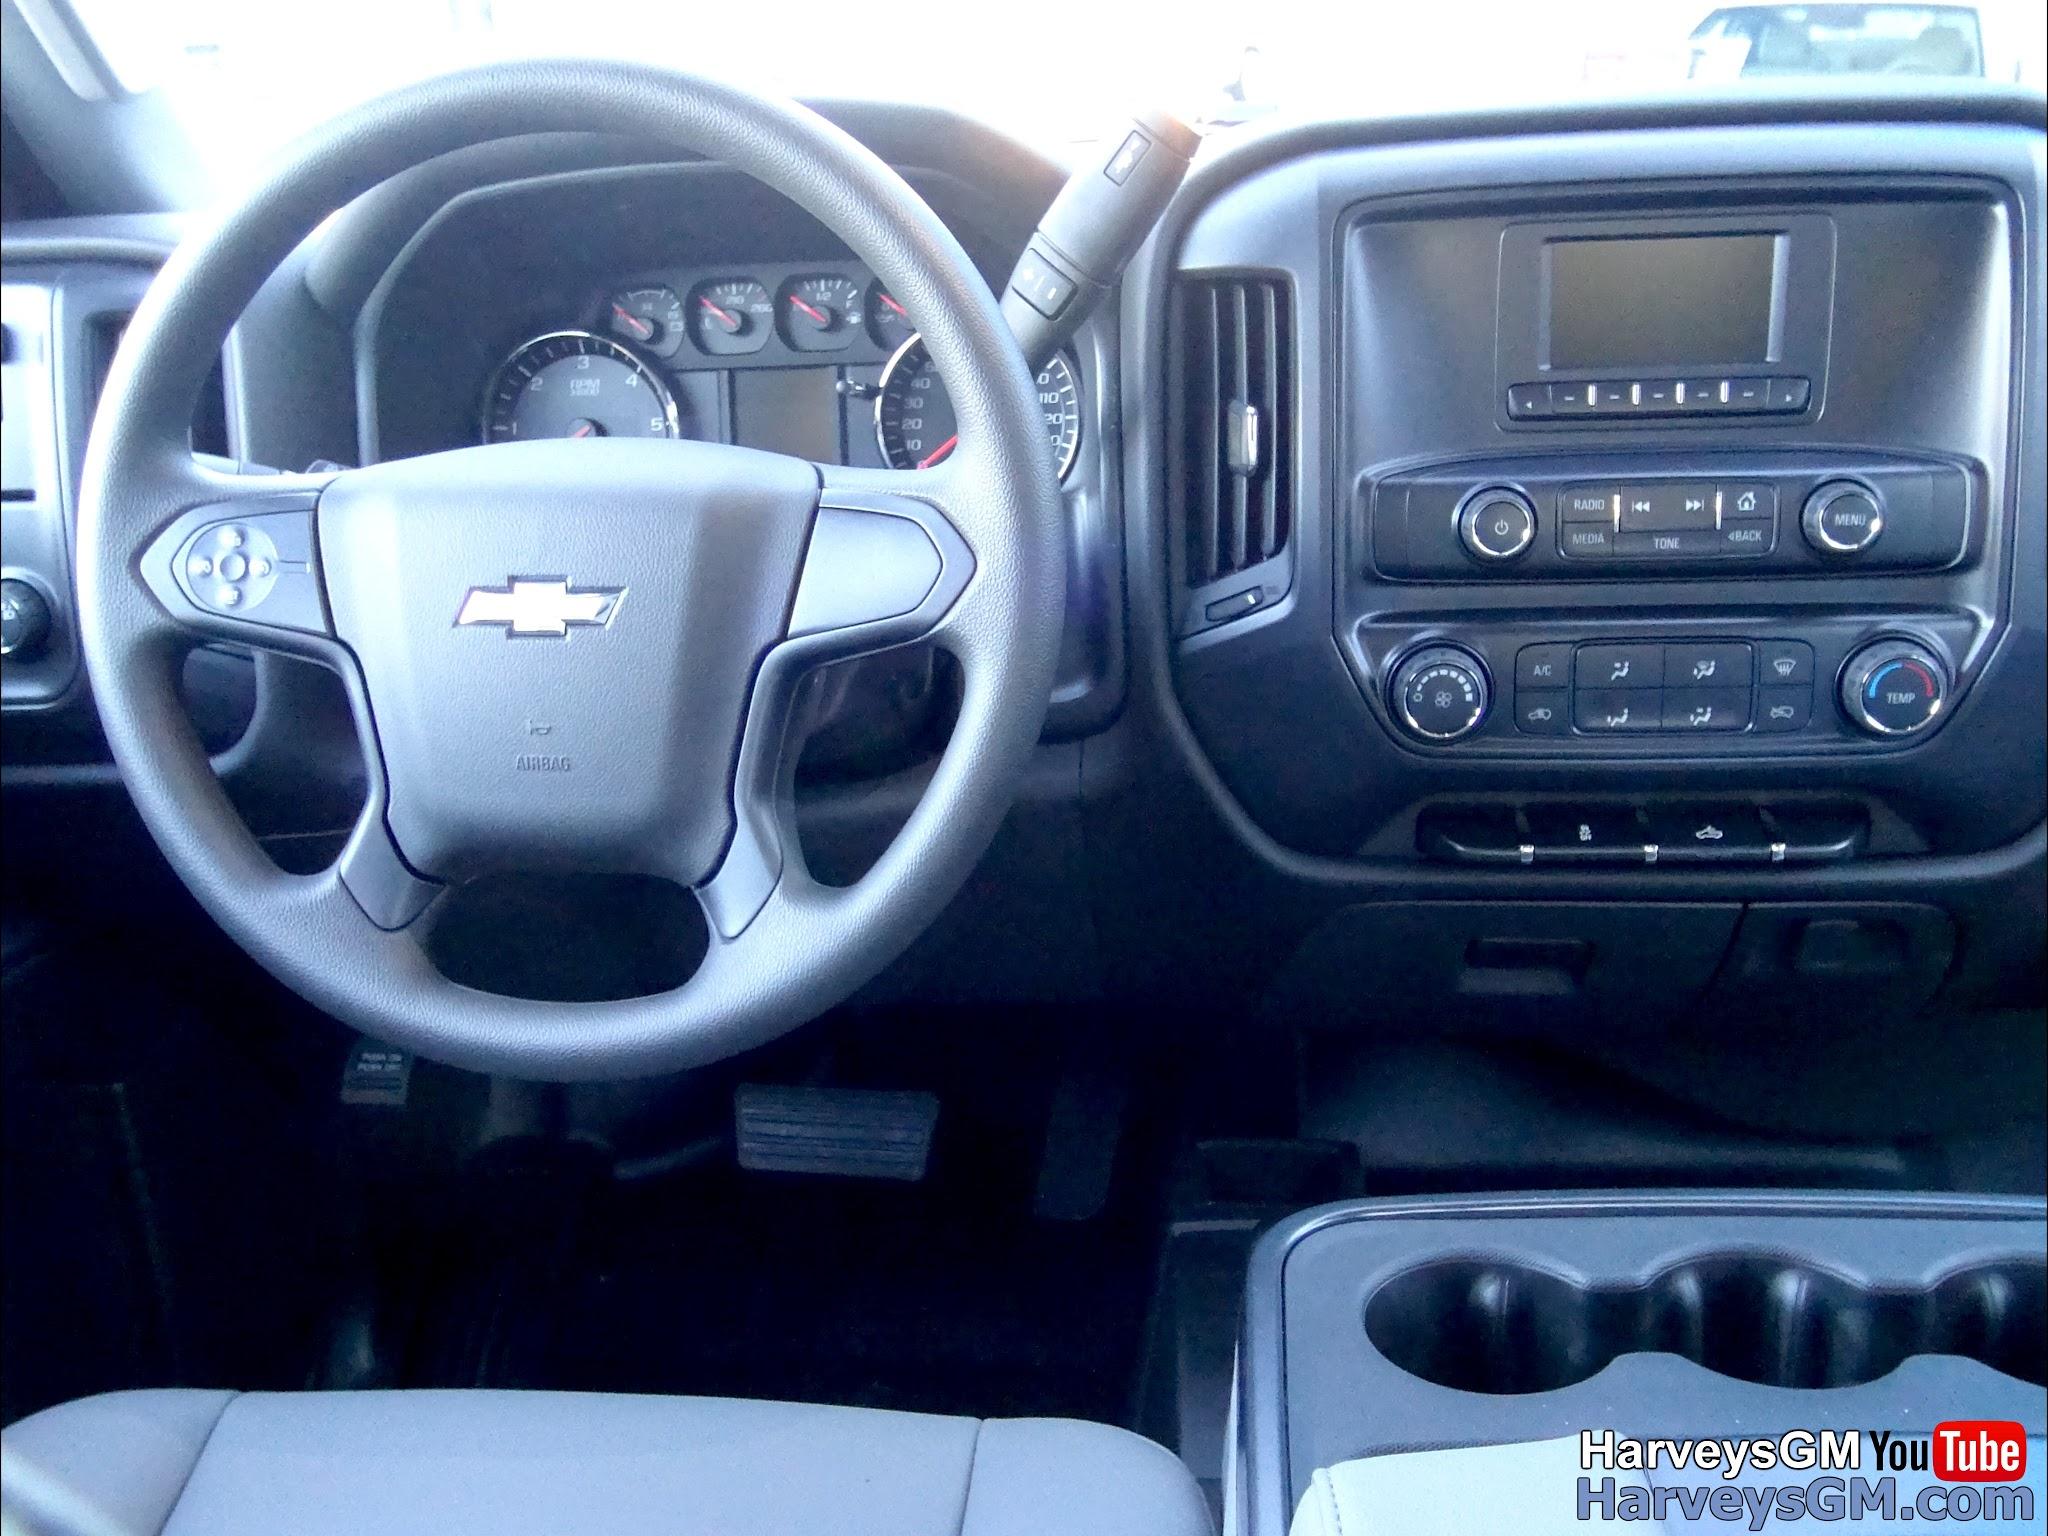 2016 Silverado Brake Controller Best 2018 Prodigy Wiring Gmc Installation Ford F 450 Vs Chevrolet 4500